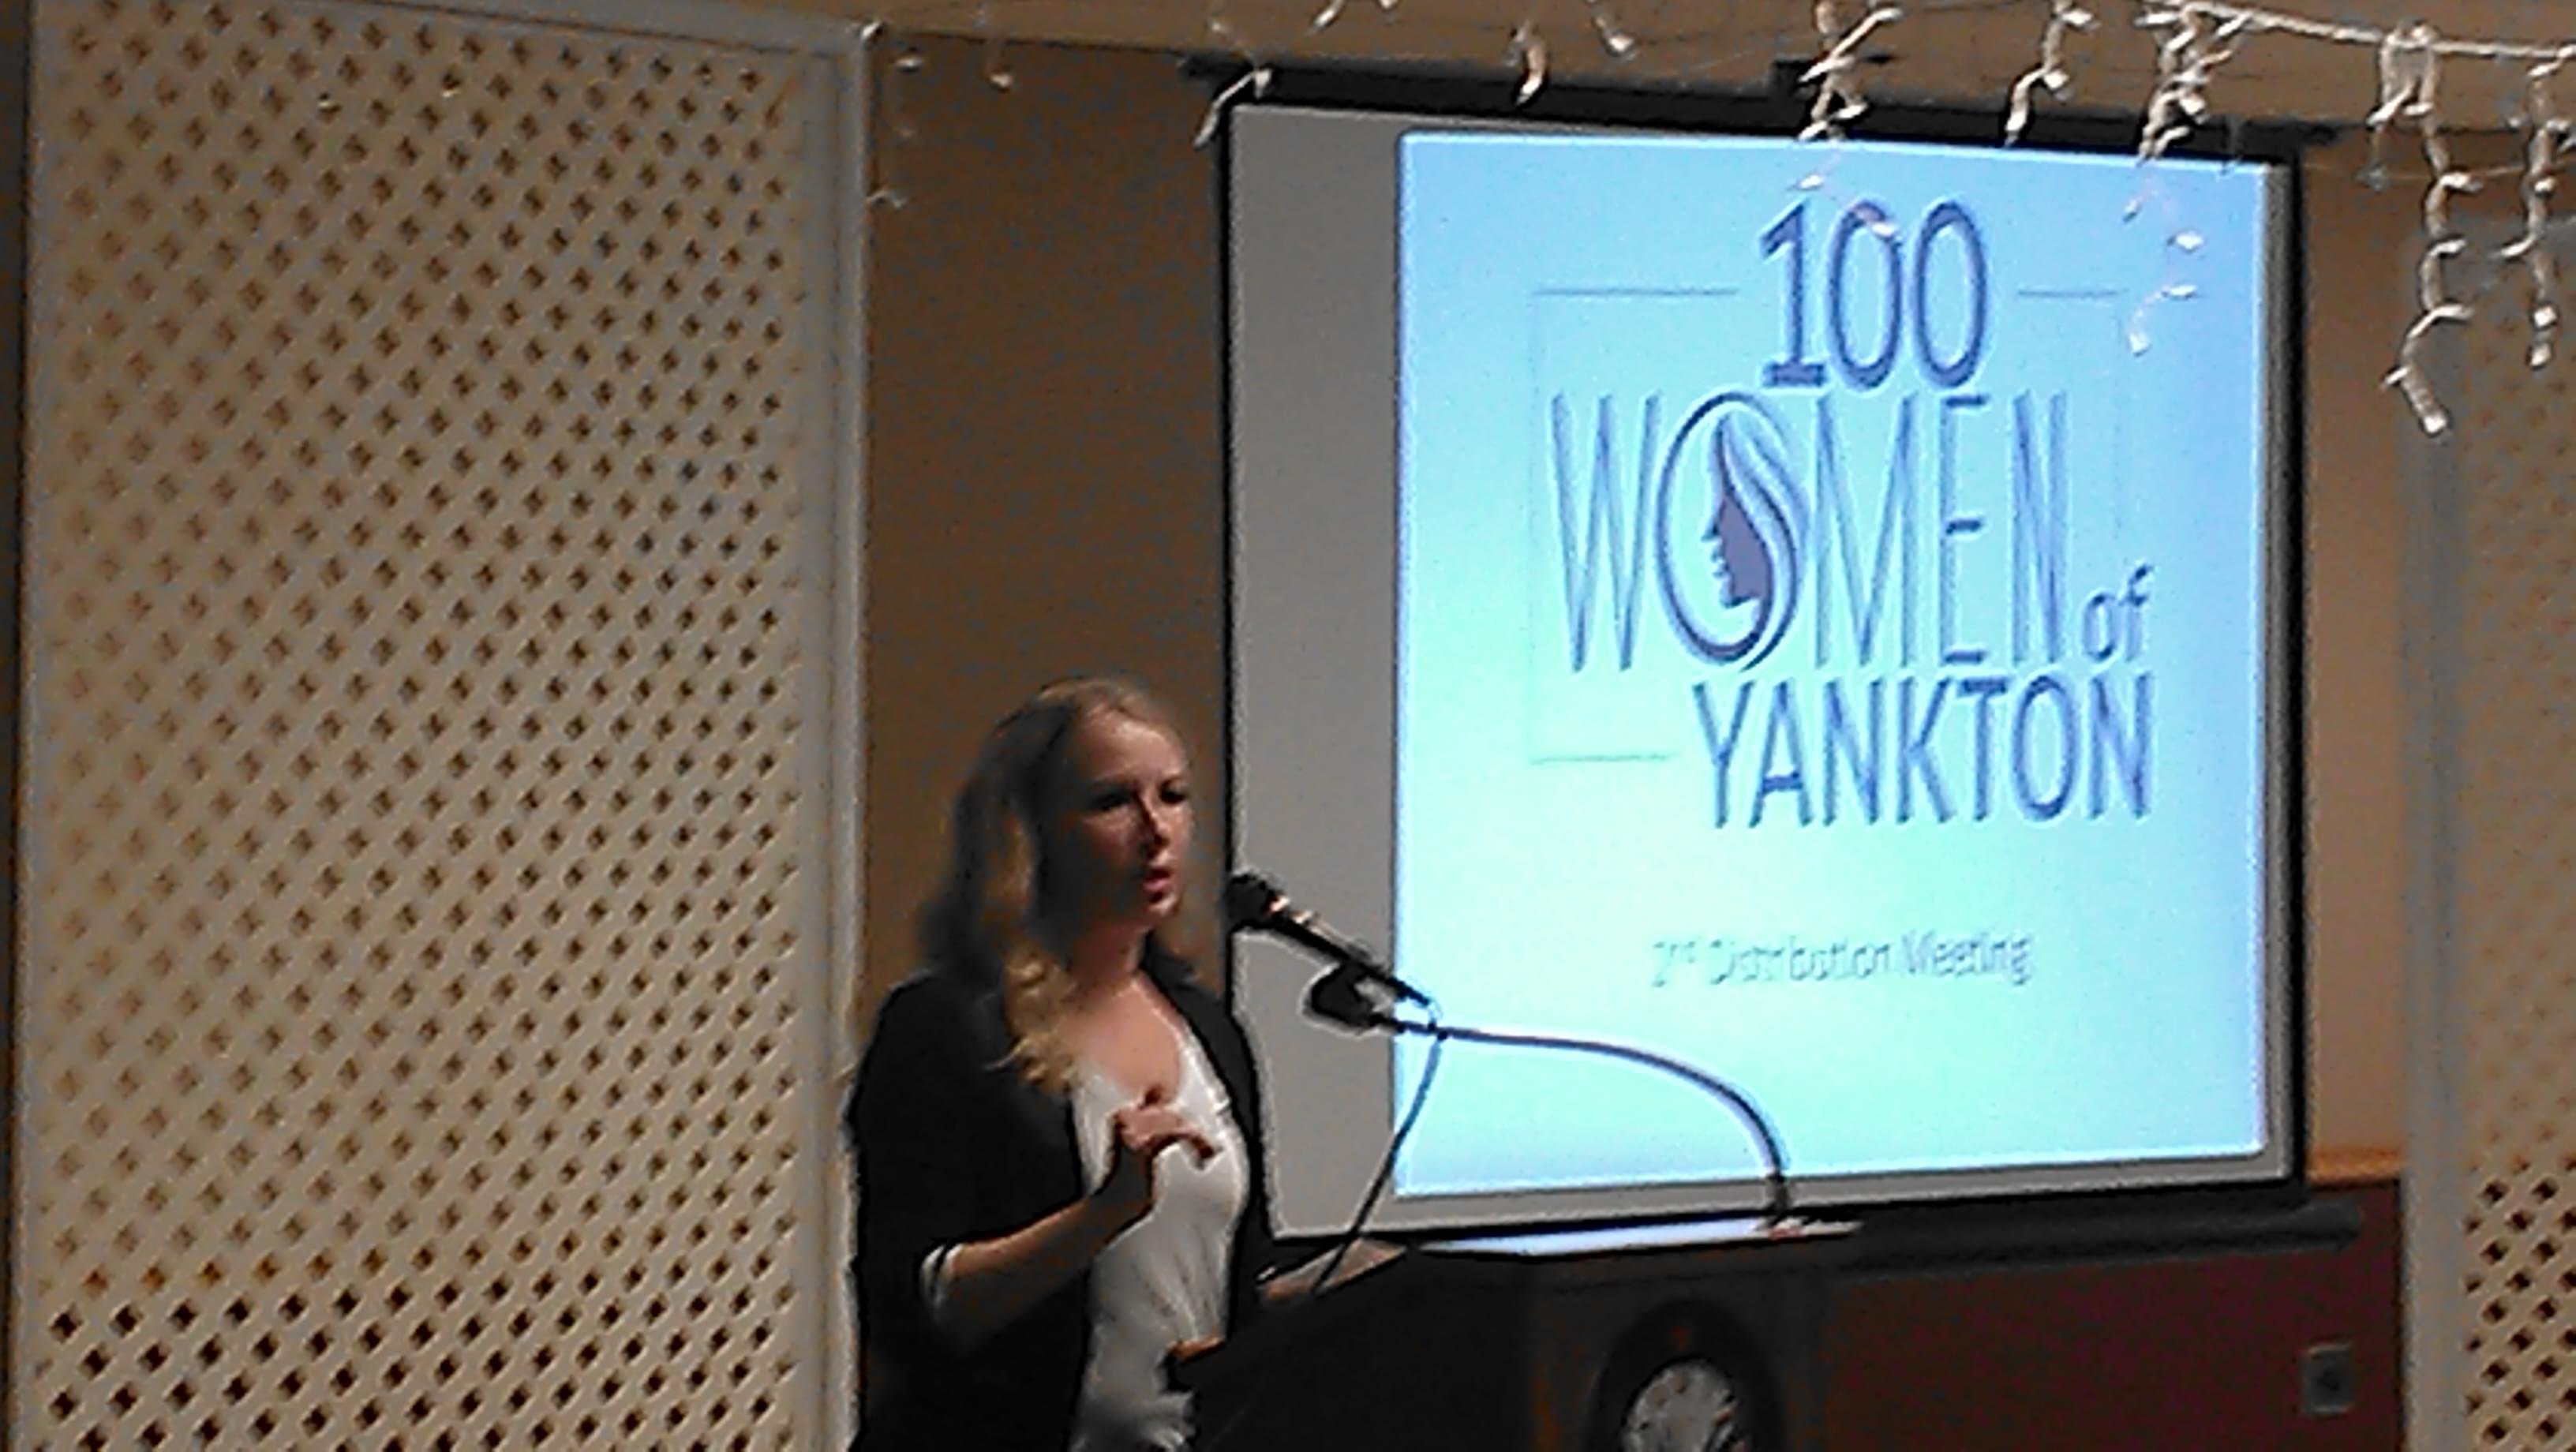 100 Women Of Yankton